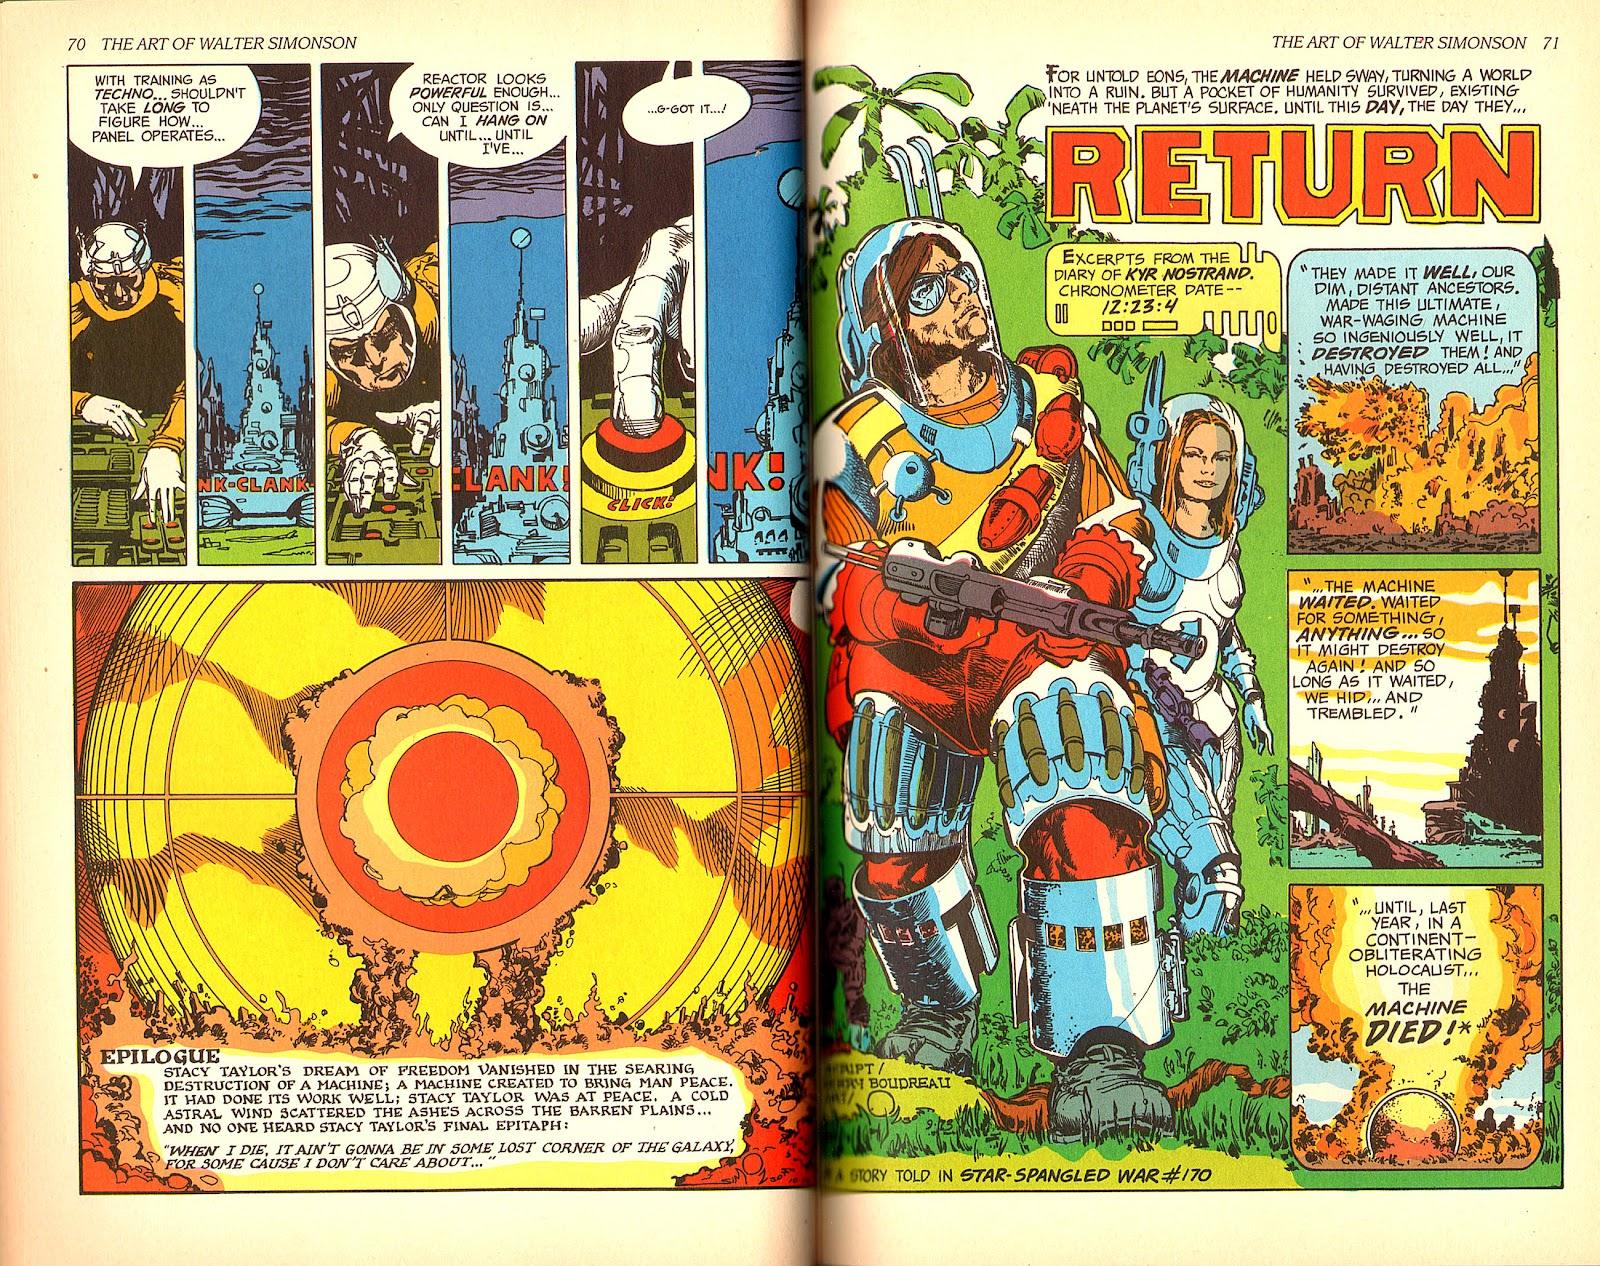 Read online The Art of Walter Simonson comic -  Issue # TPB - 37